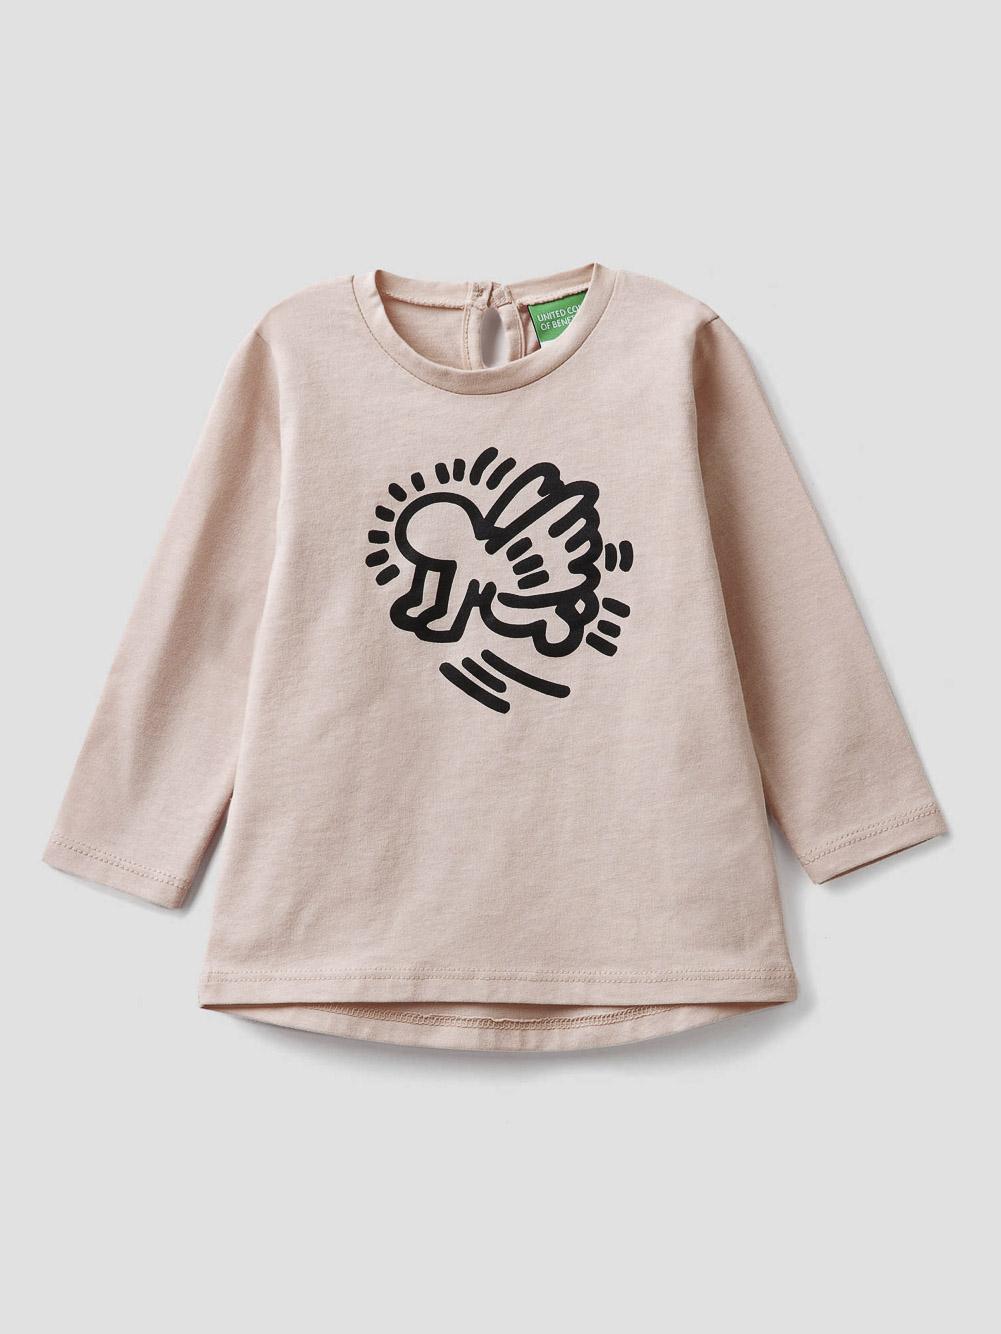 "012 BENETTON T-shirt με τύπωμα ""Keith Haring"" 3VR5C14U9 20A04U"